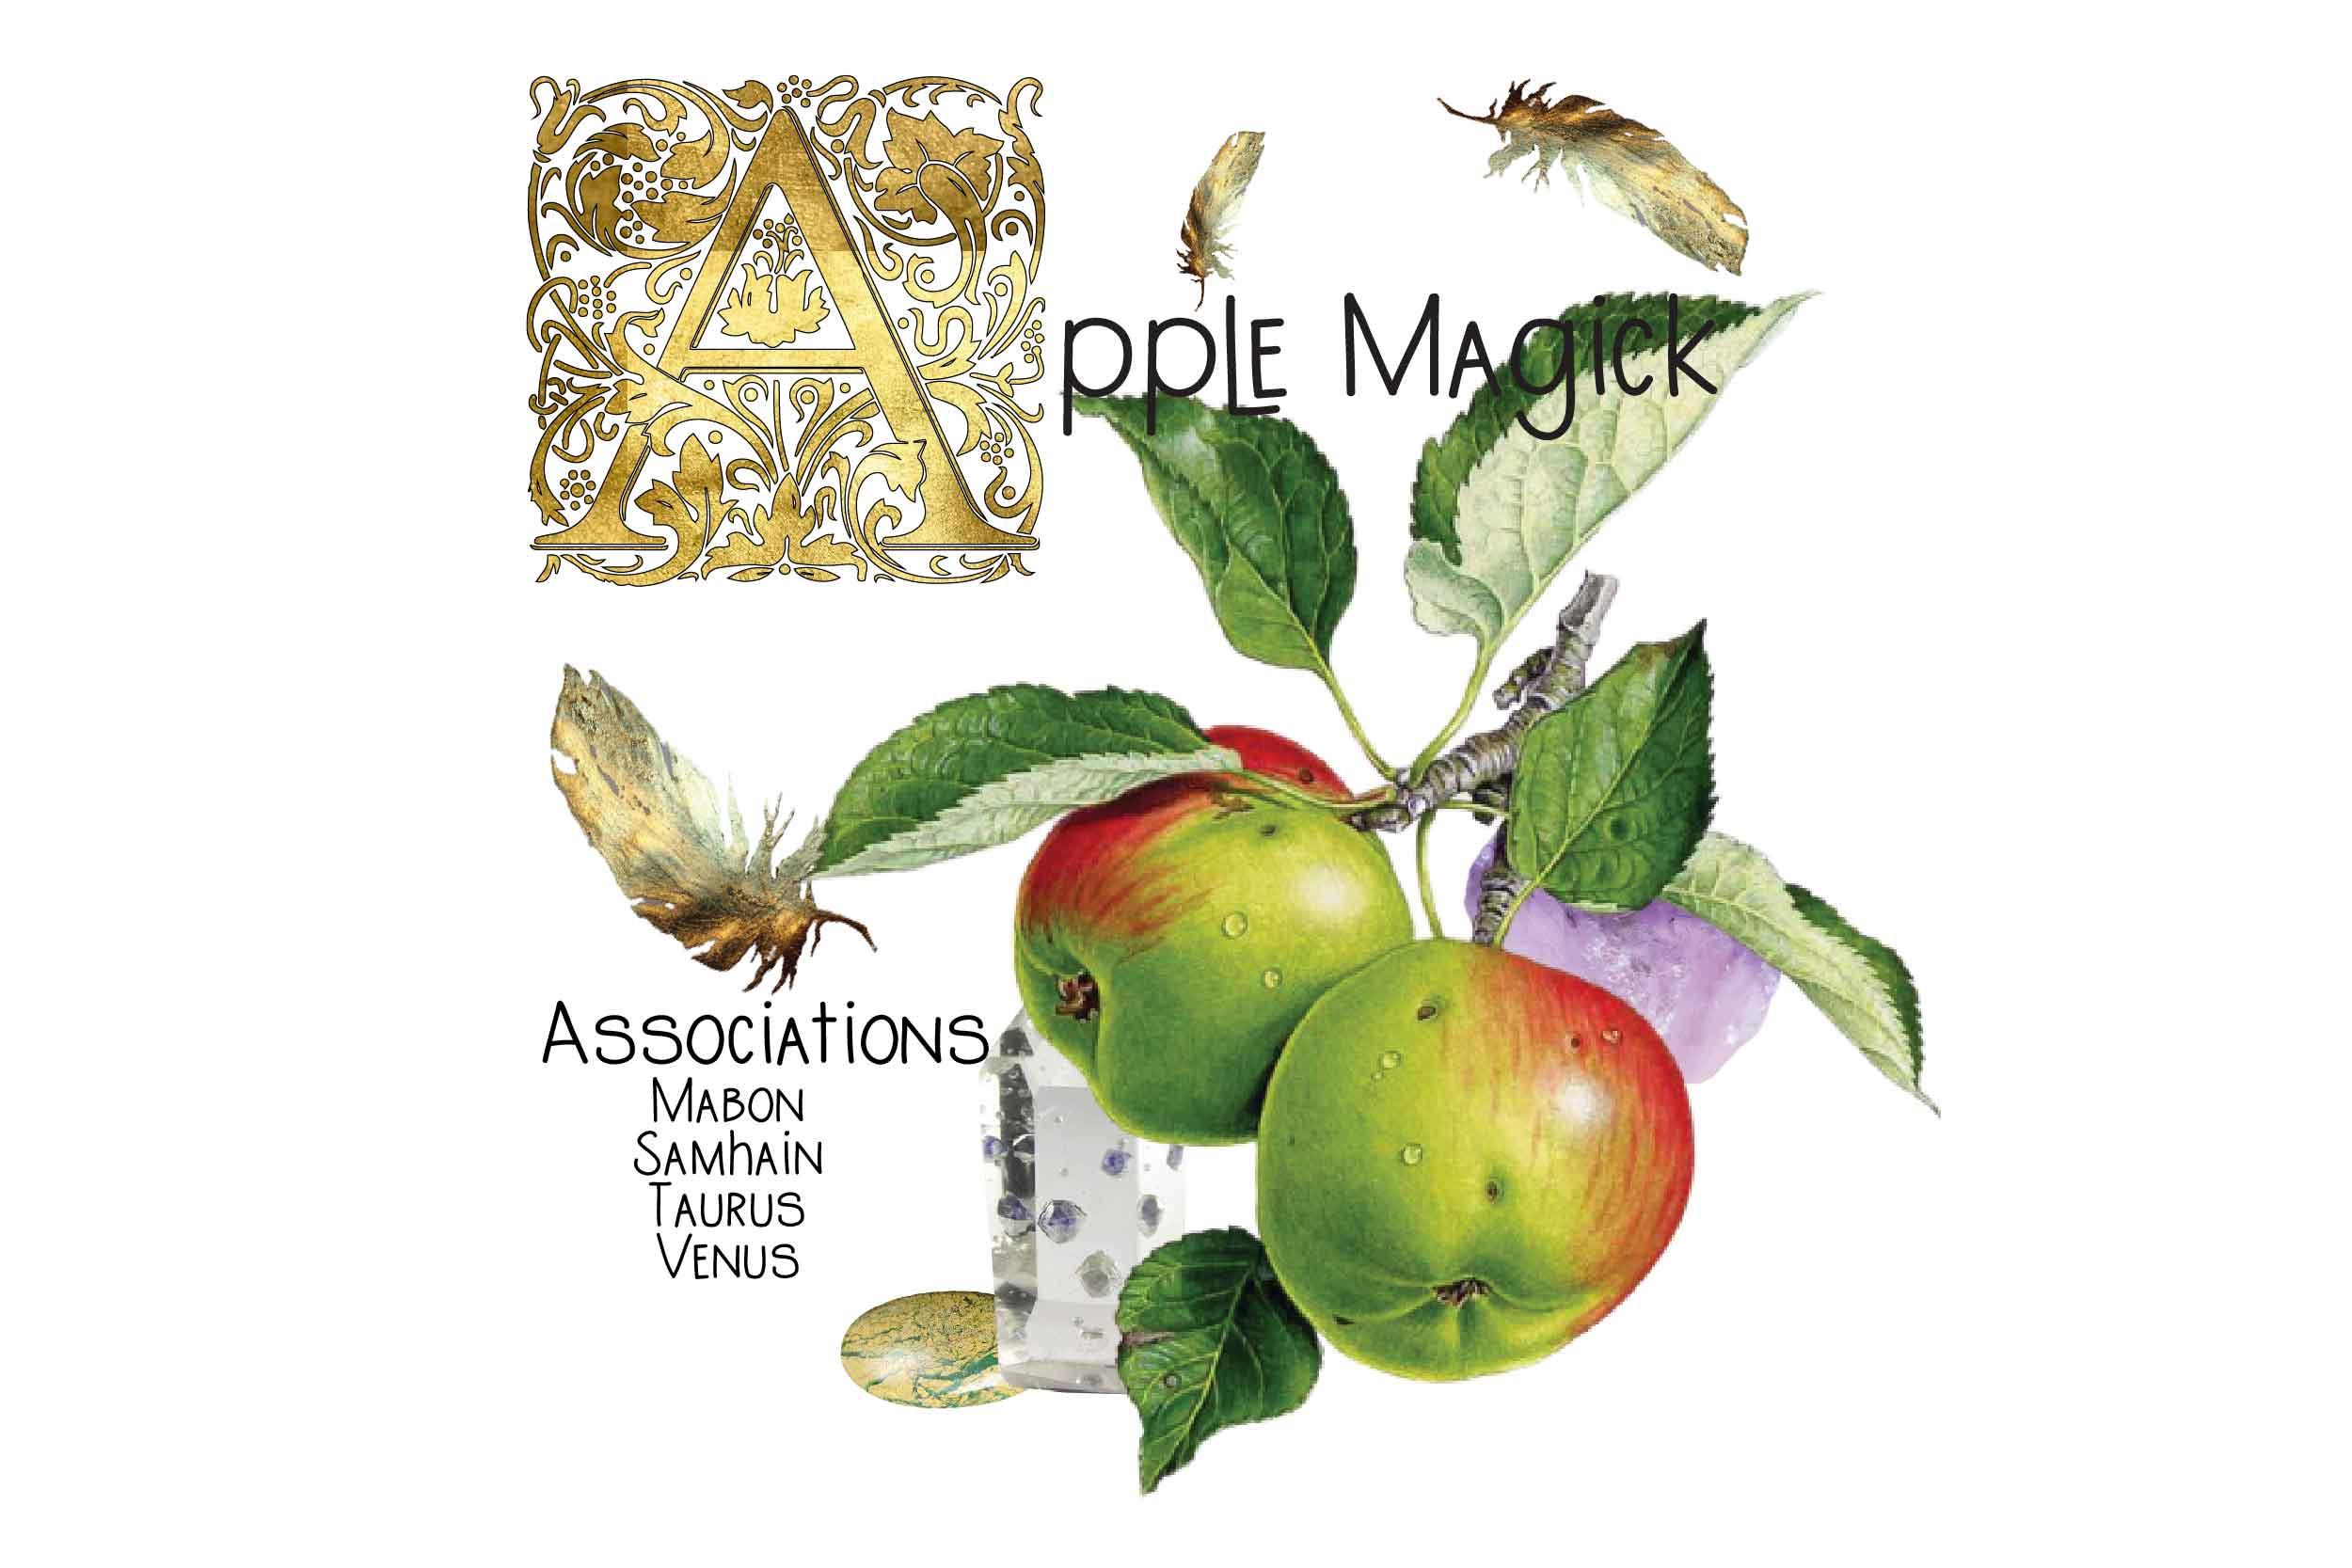 Apple magick